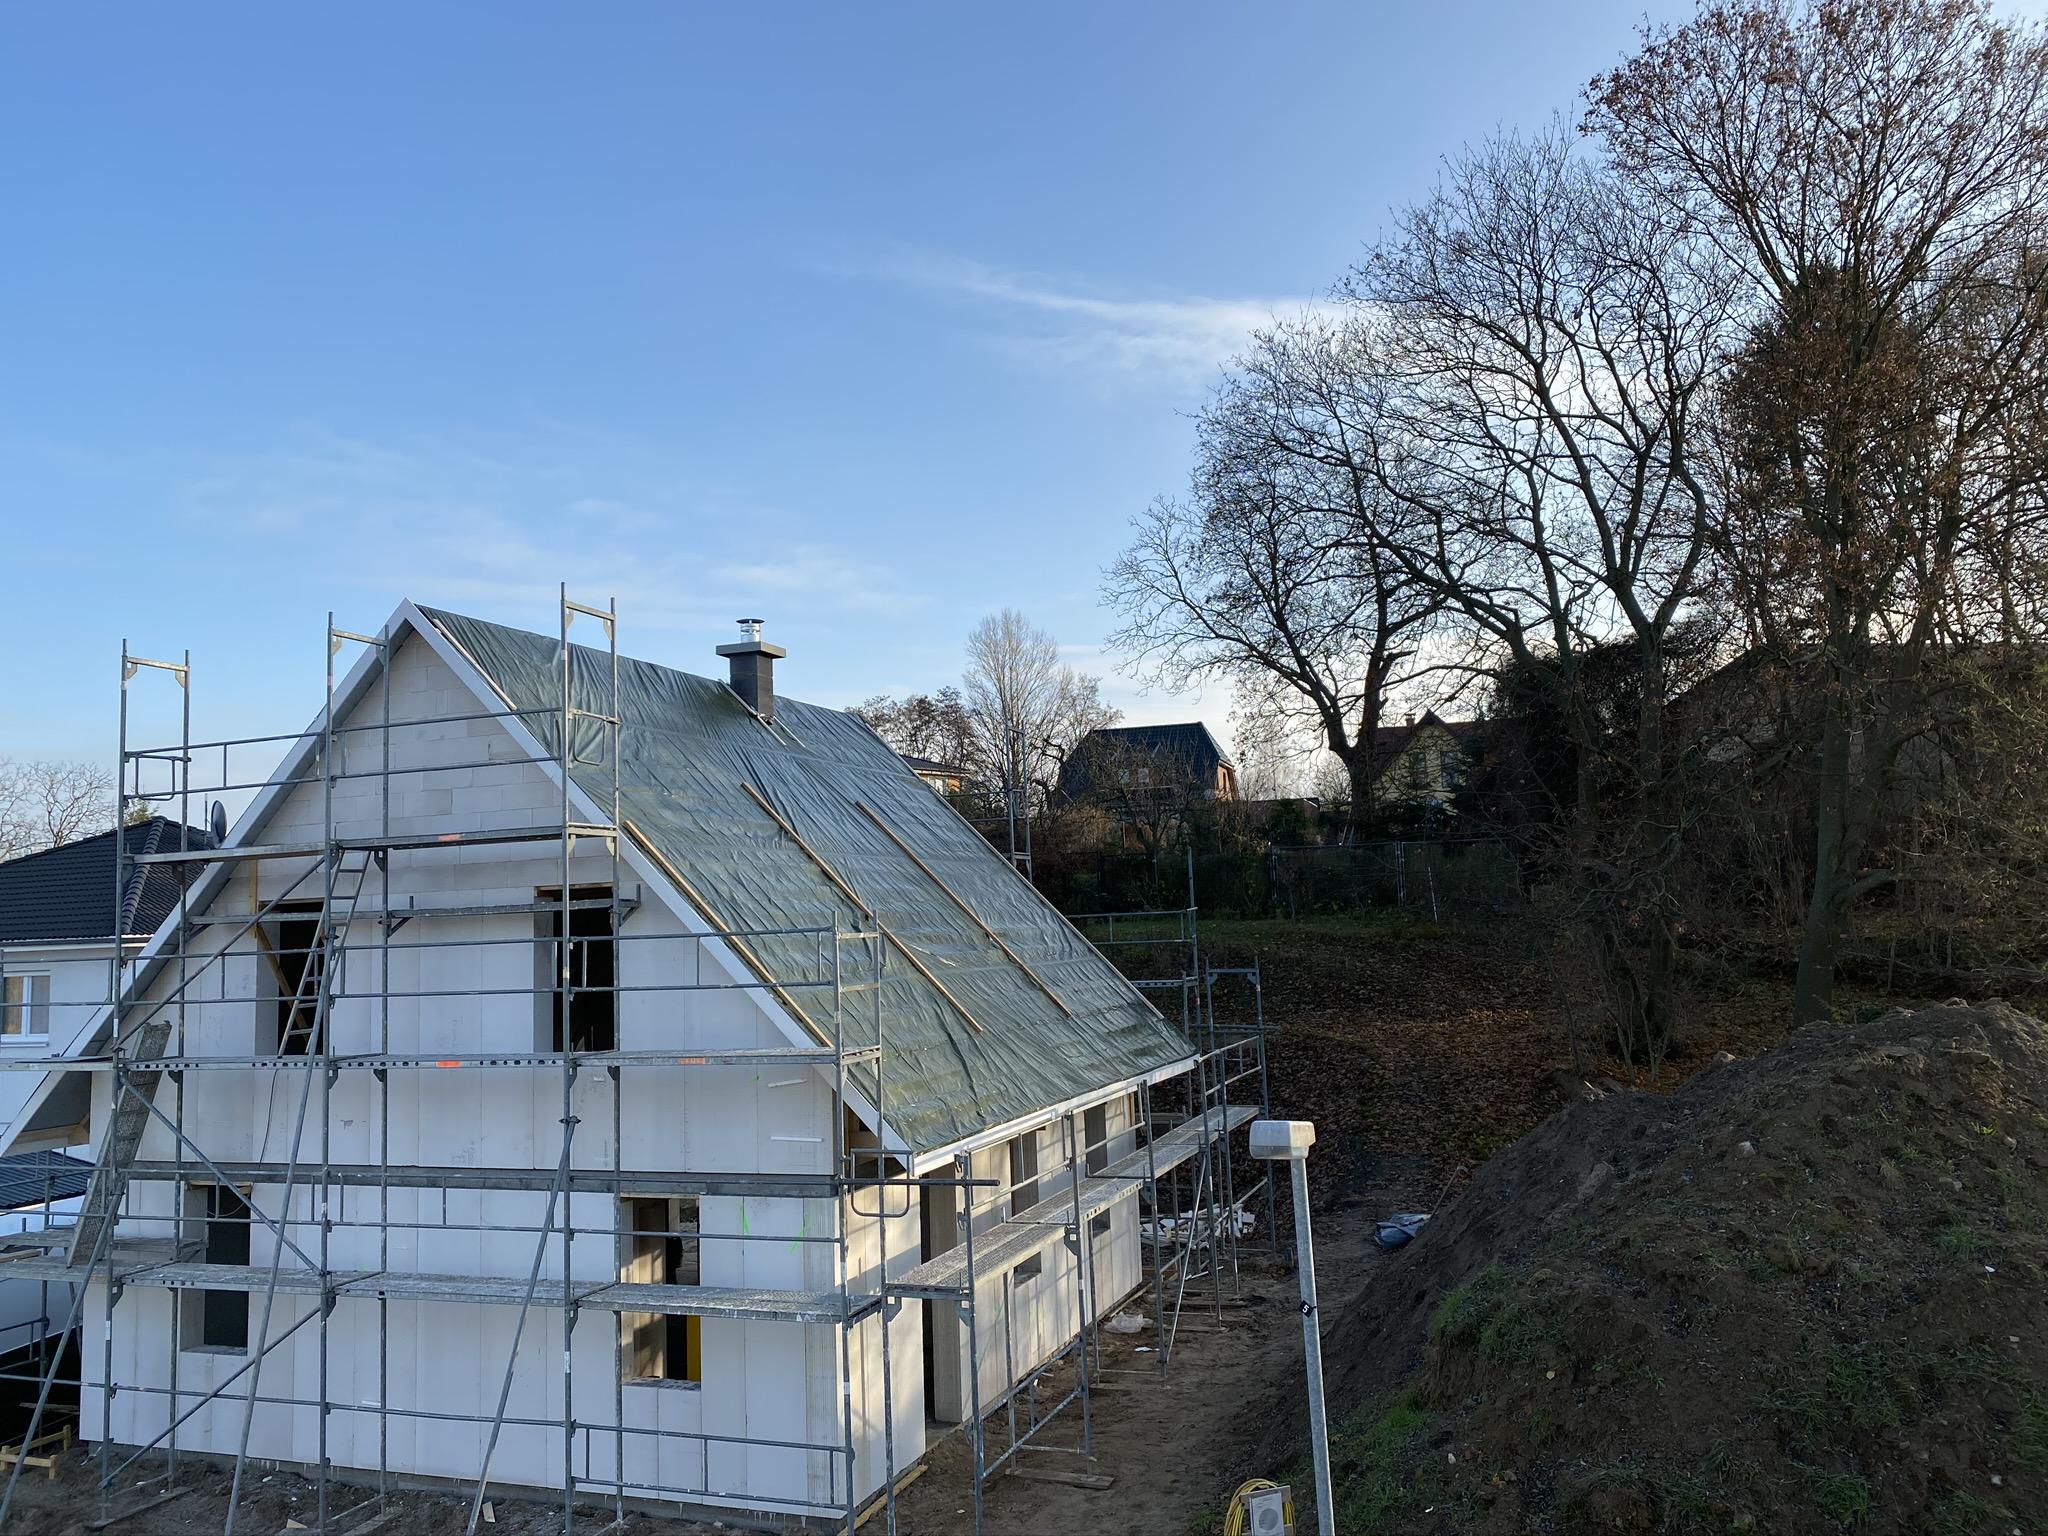 grüne Plane auf dem Dach